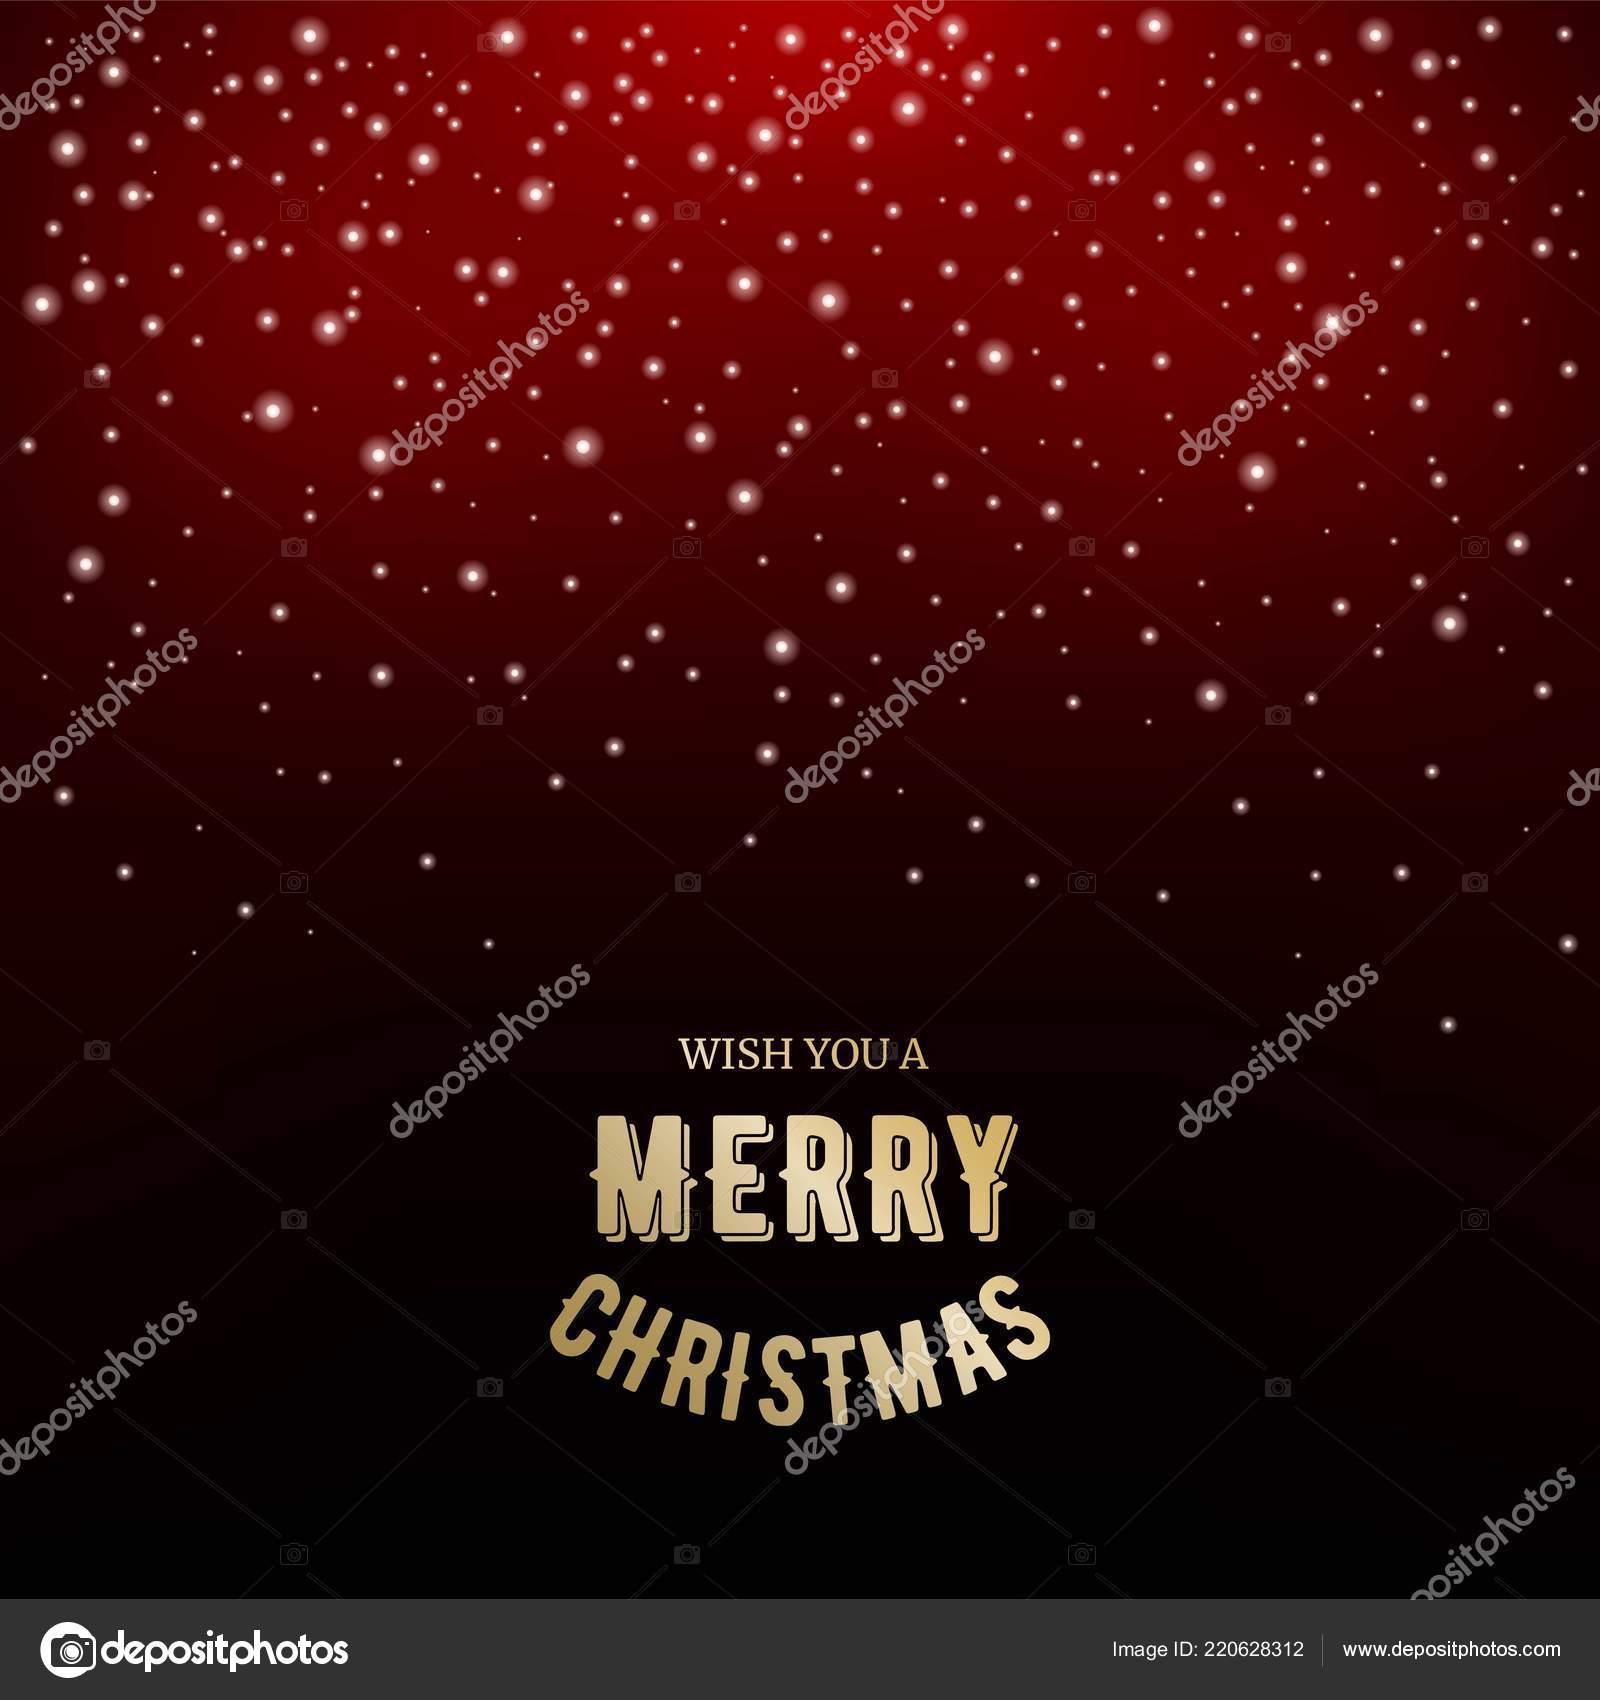 Frohe Weihnachten Glitzer.Frohe Weihnachten Glitzer Bilder Frohe Weihnachten Glitzer Bilder